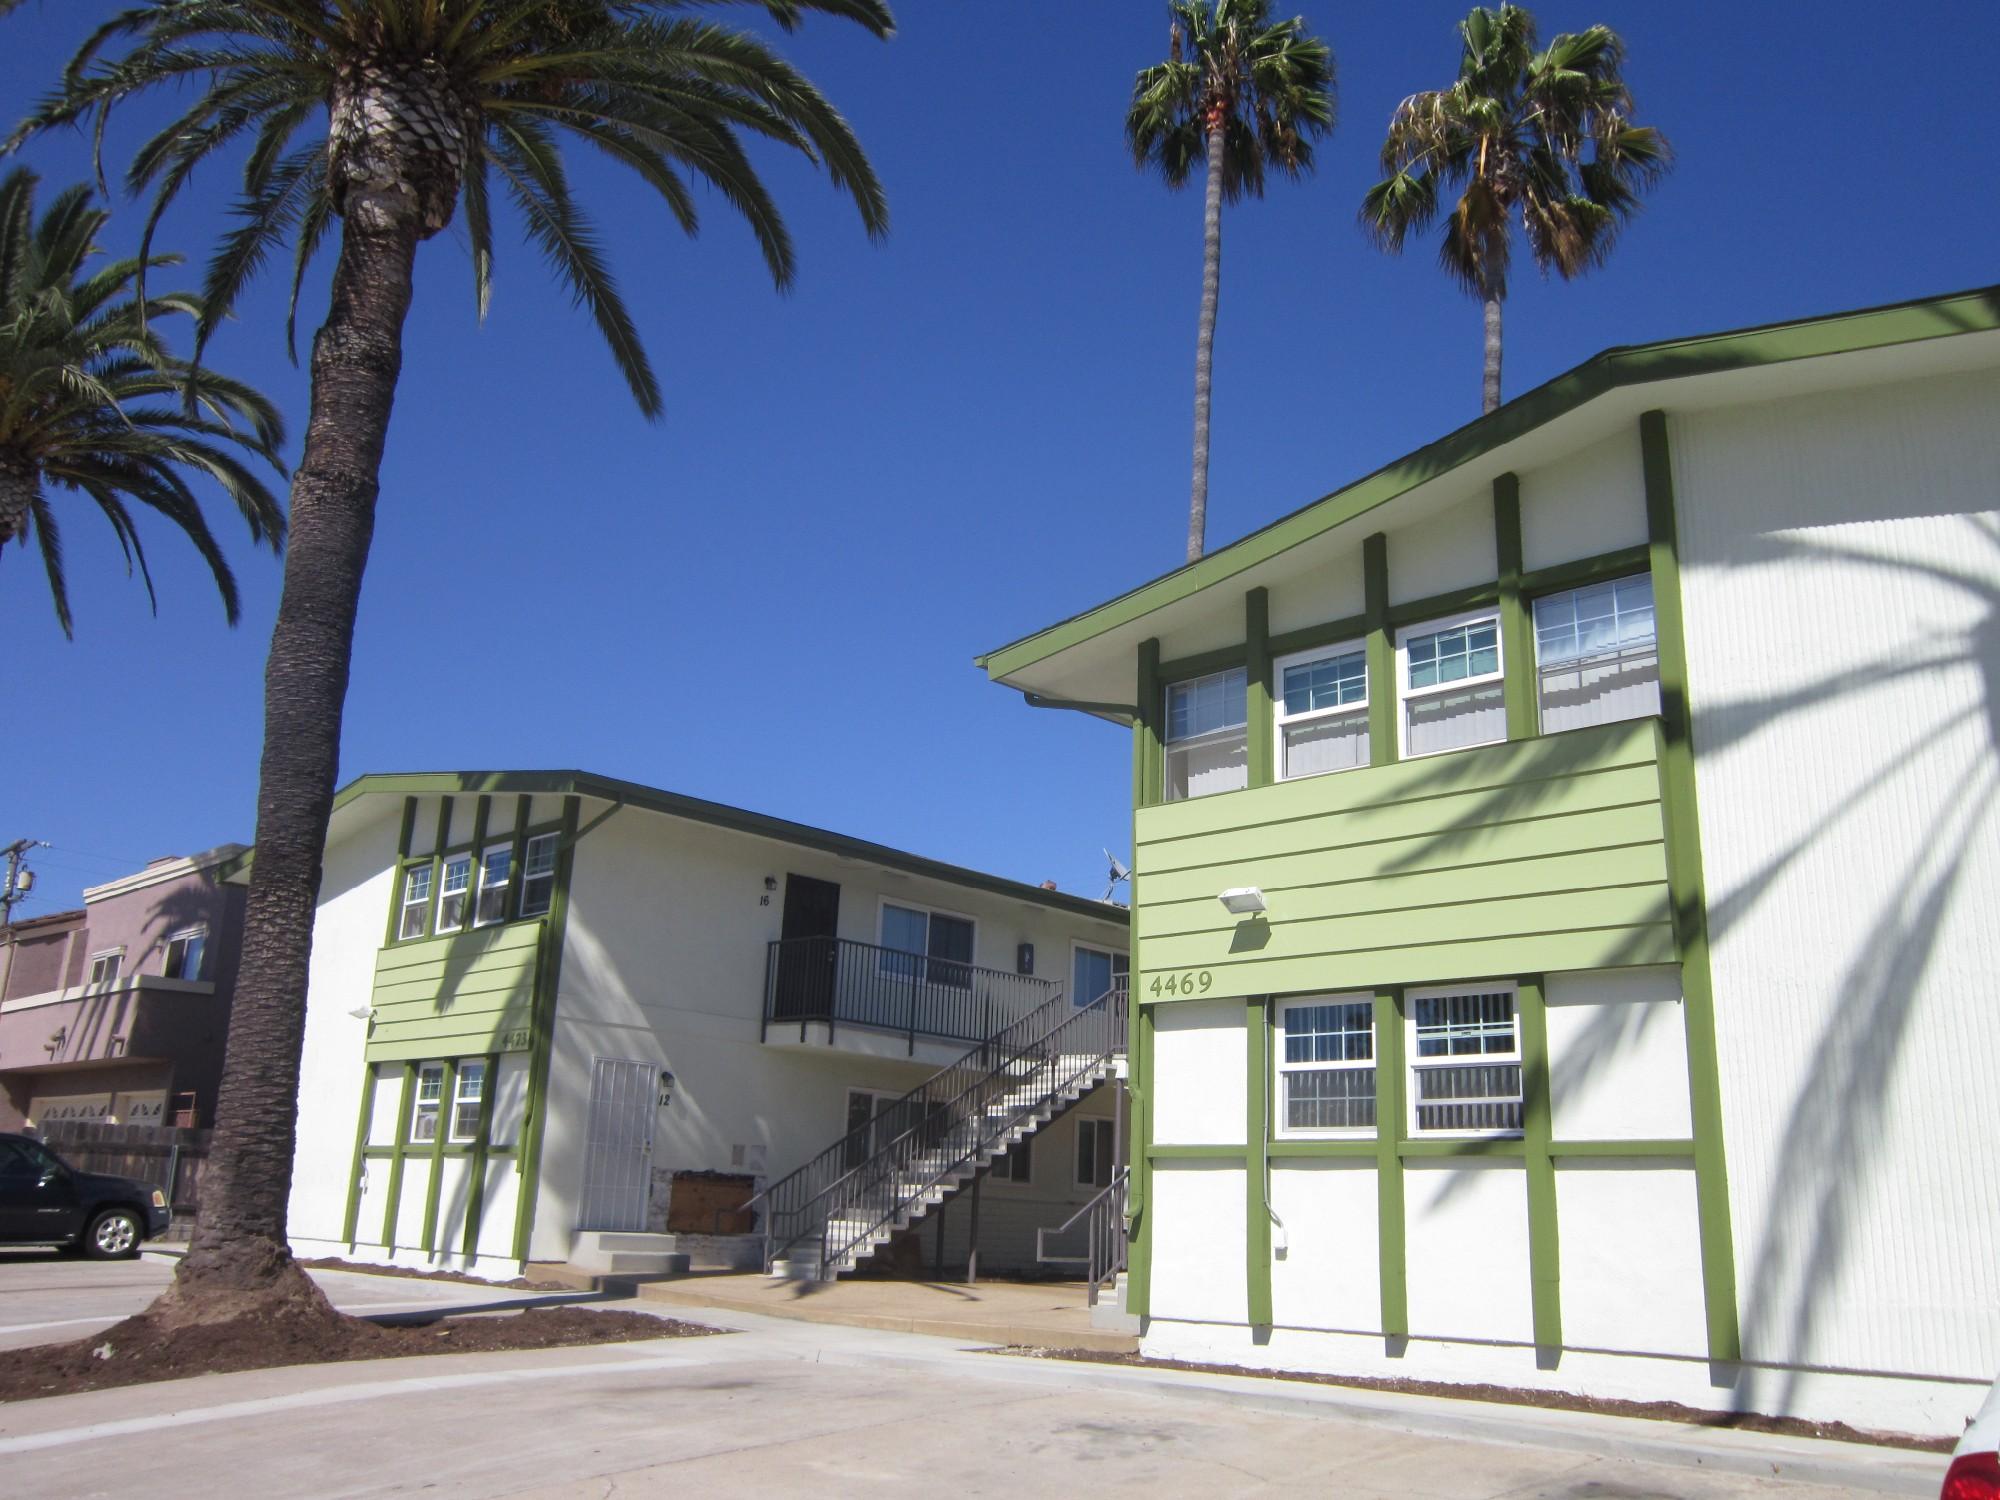 Sold - Alabama Palms Apartments - North Park, Ca.